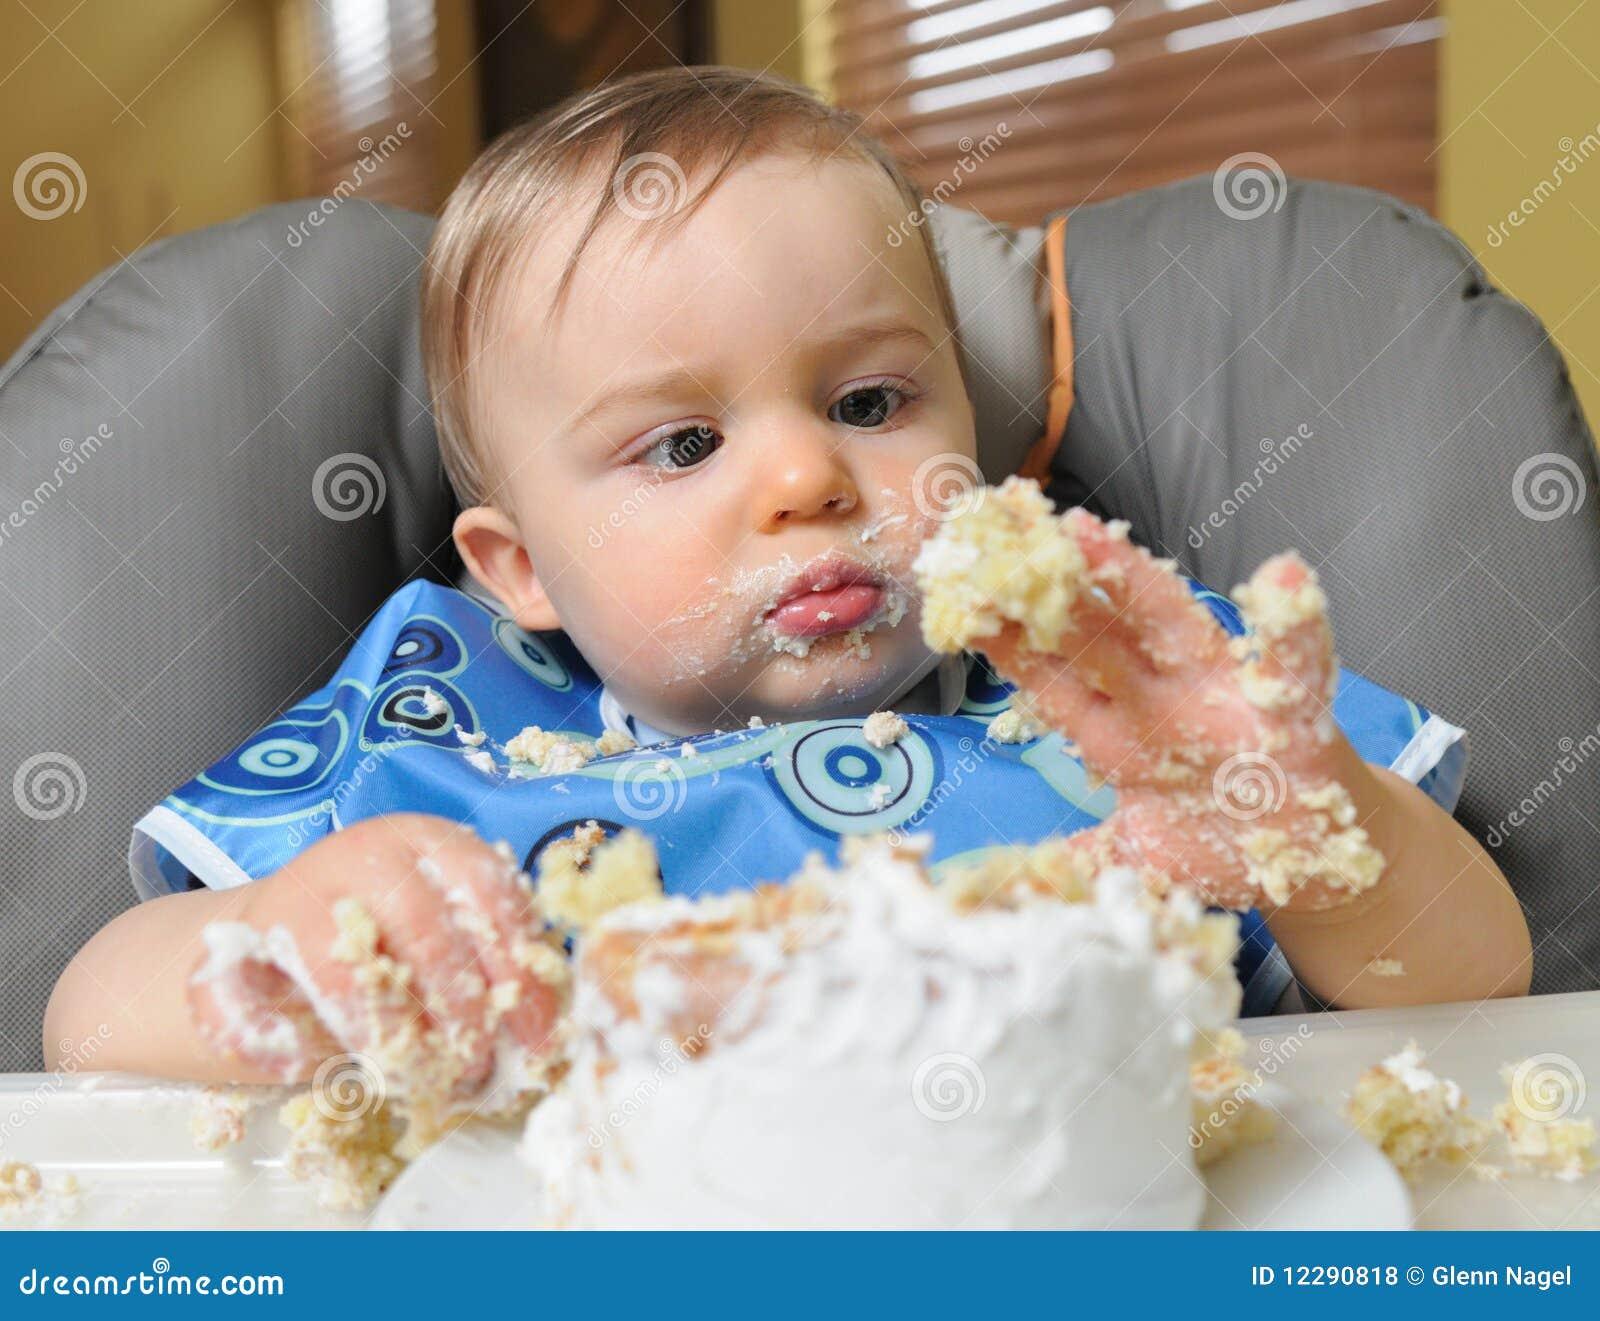 sweet baby boy eating birthday cake stock photos images on images baby eating birthday cake